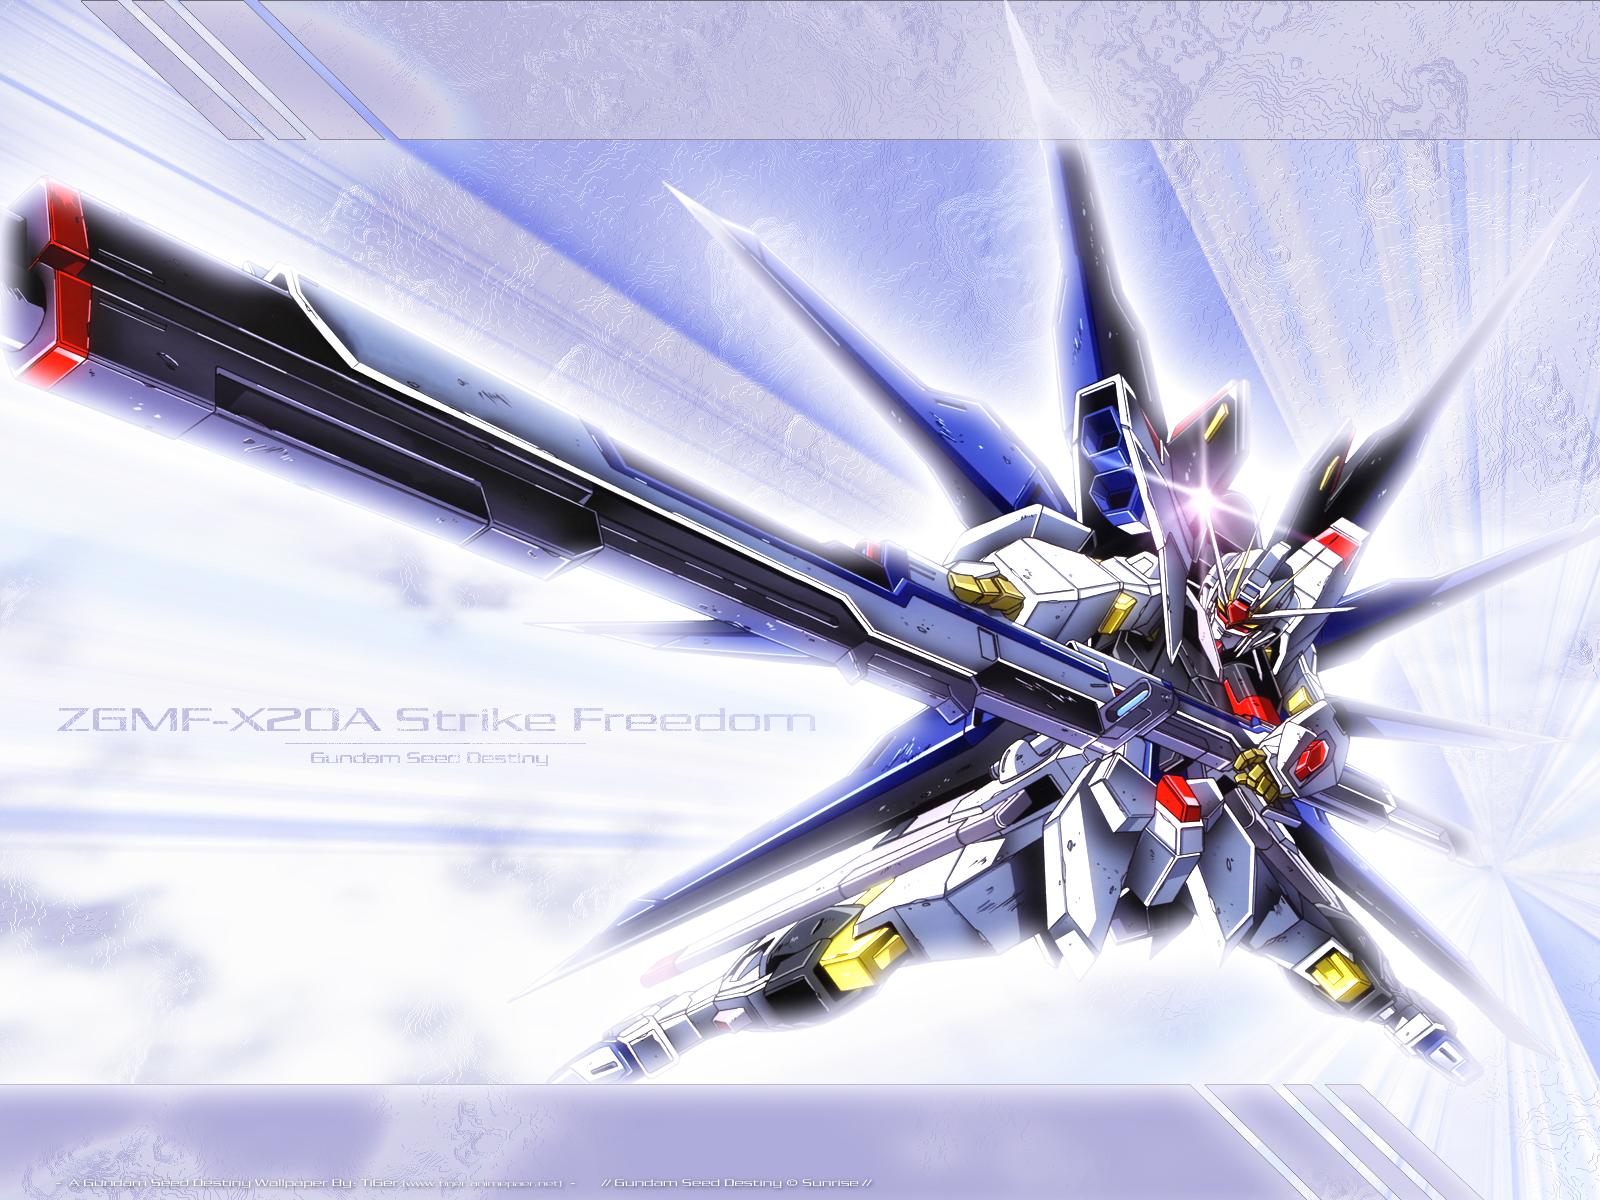 http://1.bp.blogspot.com/-MCMhOm1b8qo/UFSha2Om3tI/AAAAAAAAKdk/Ox0vJsa2NNw/s1600/Mobile-Suit-Gundam-Seed-Destiny-Wallpapers-298.jpg